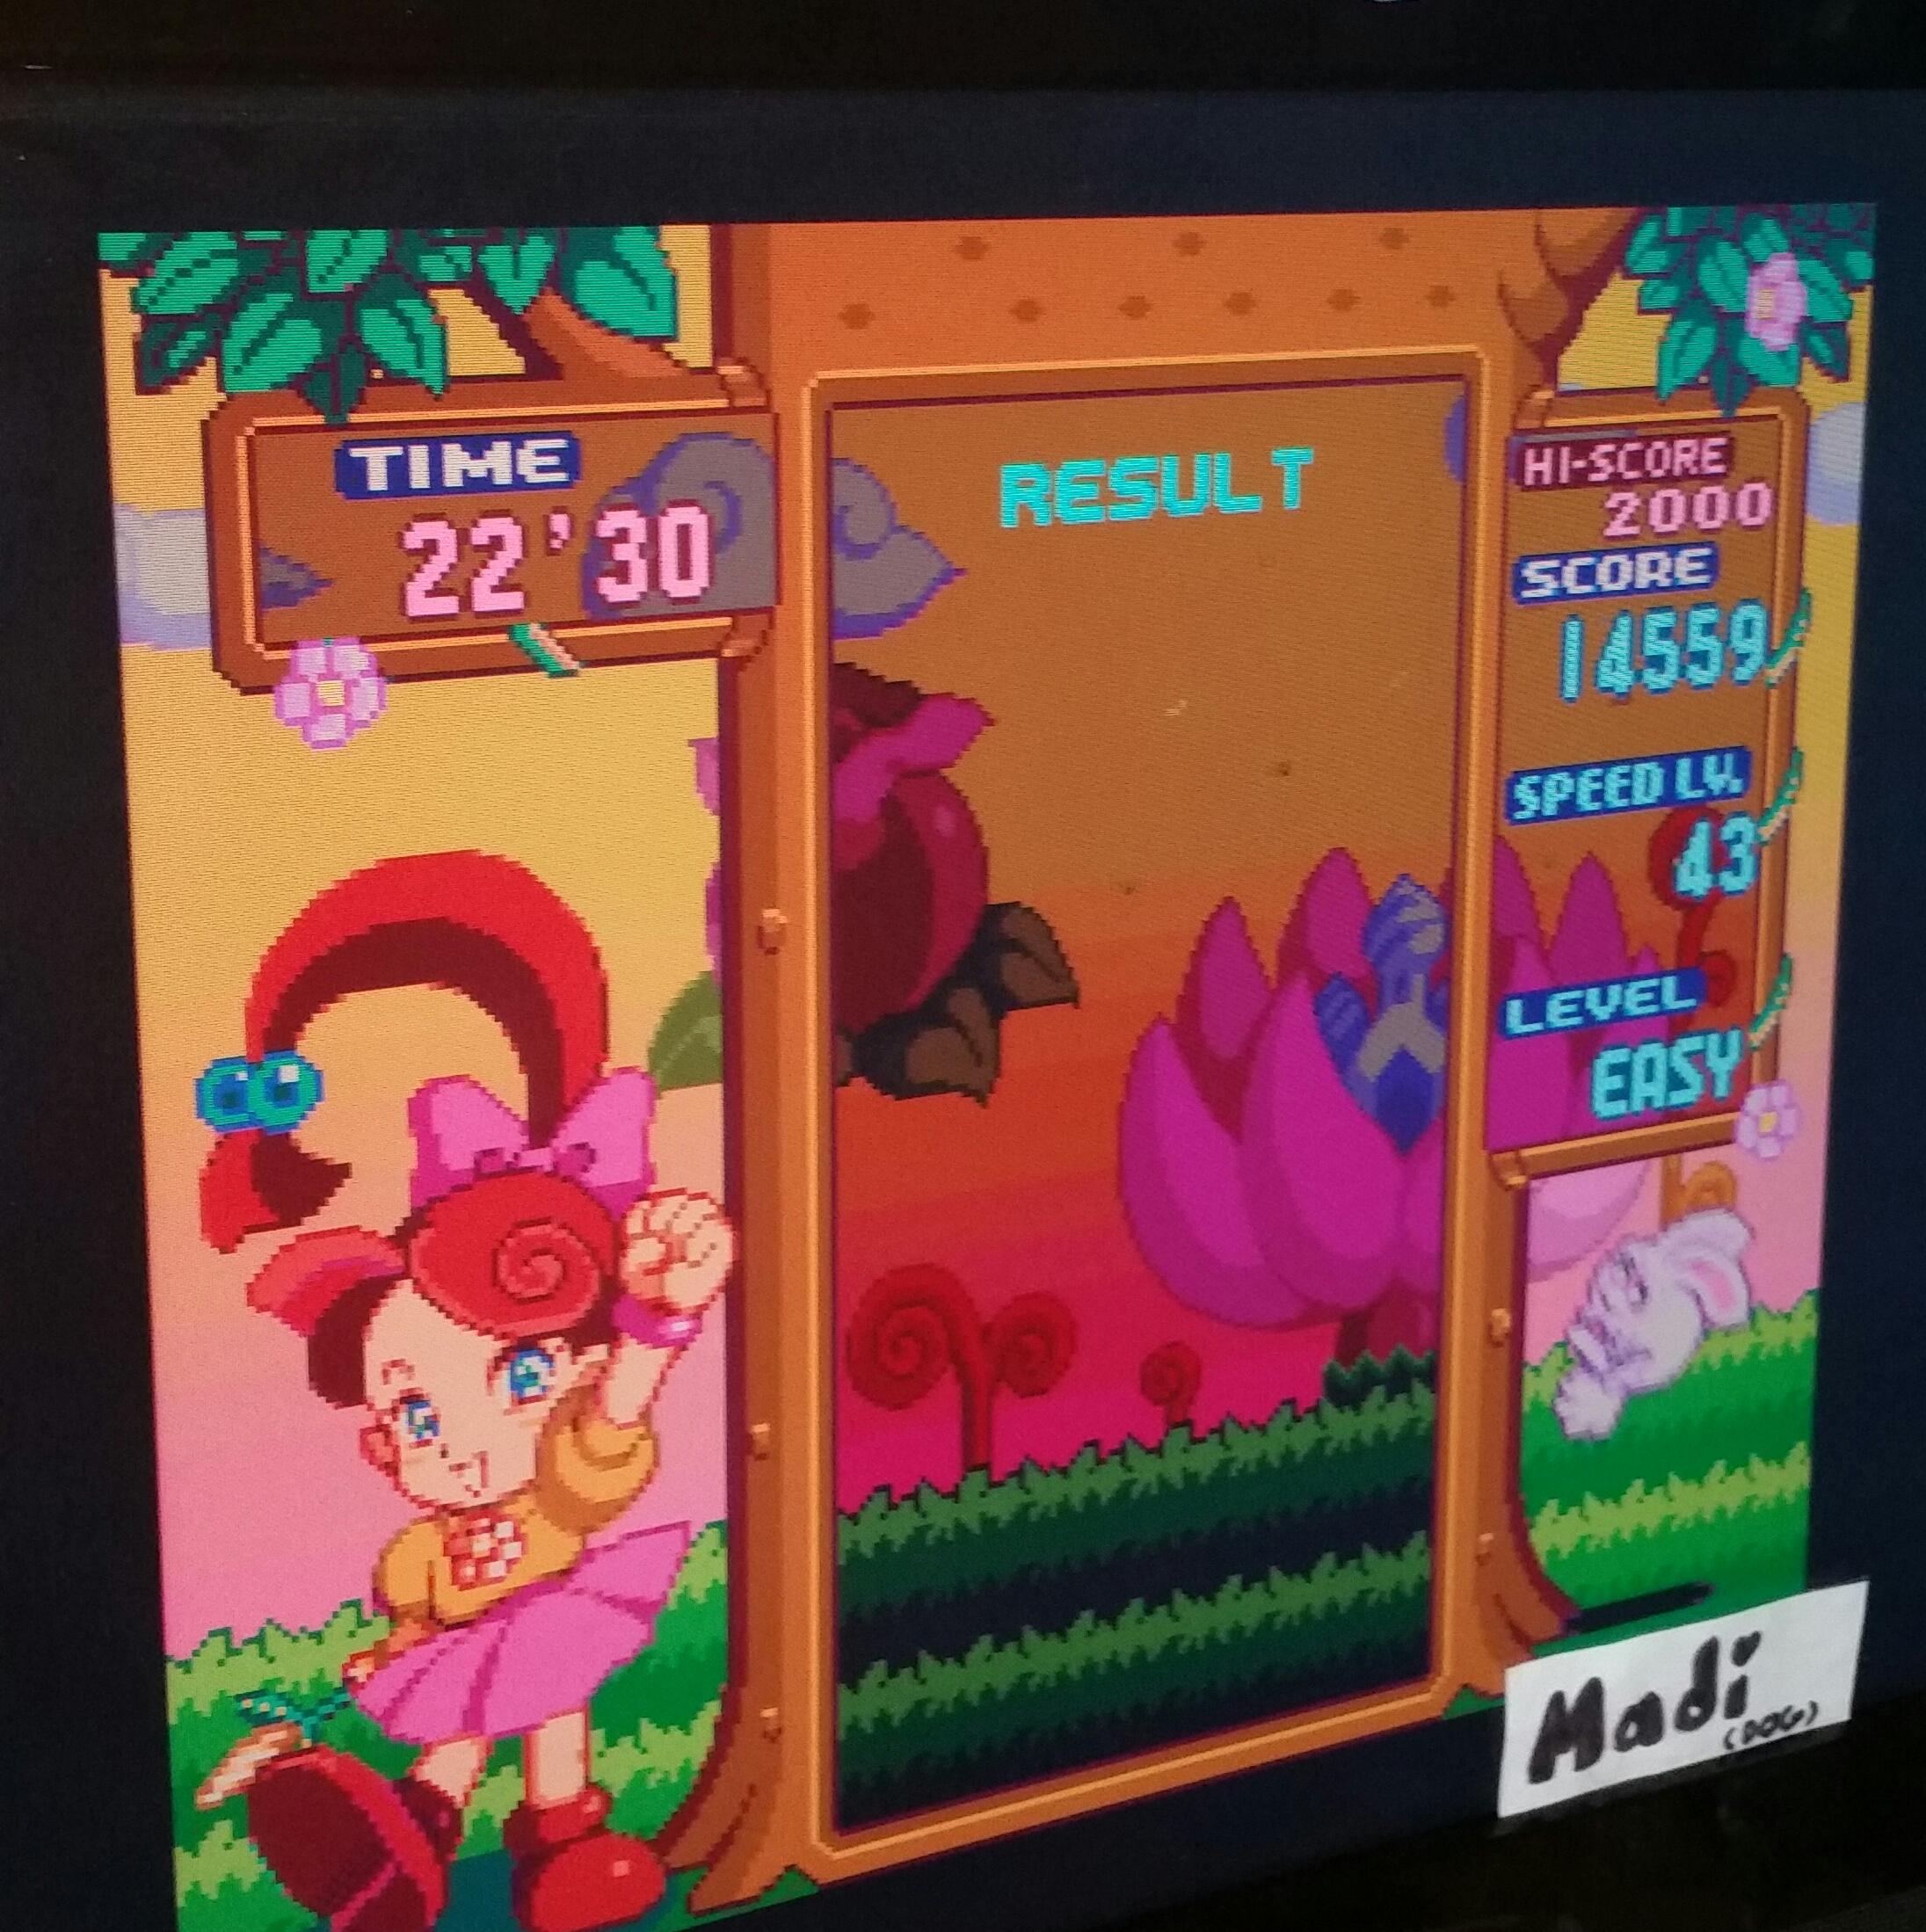 madi: Panel de Pon [Endless/Easy] (SNES/Super Famicom Emulated) 14,559 points on 2016-11-14 17:30:22